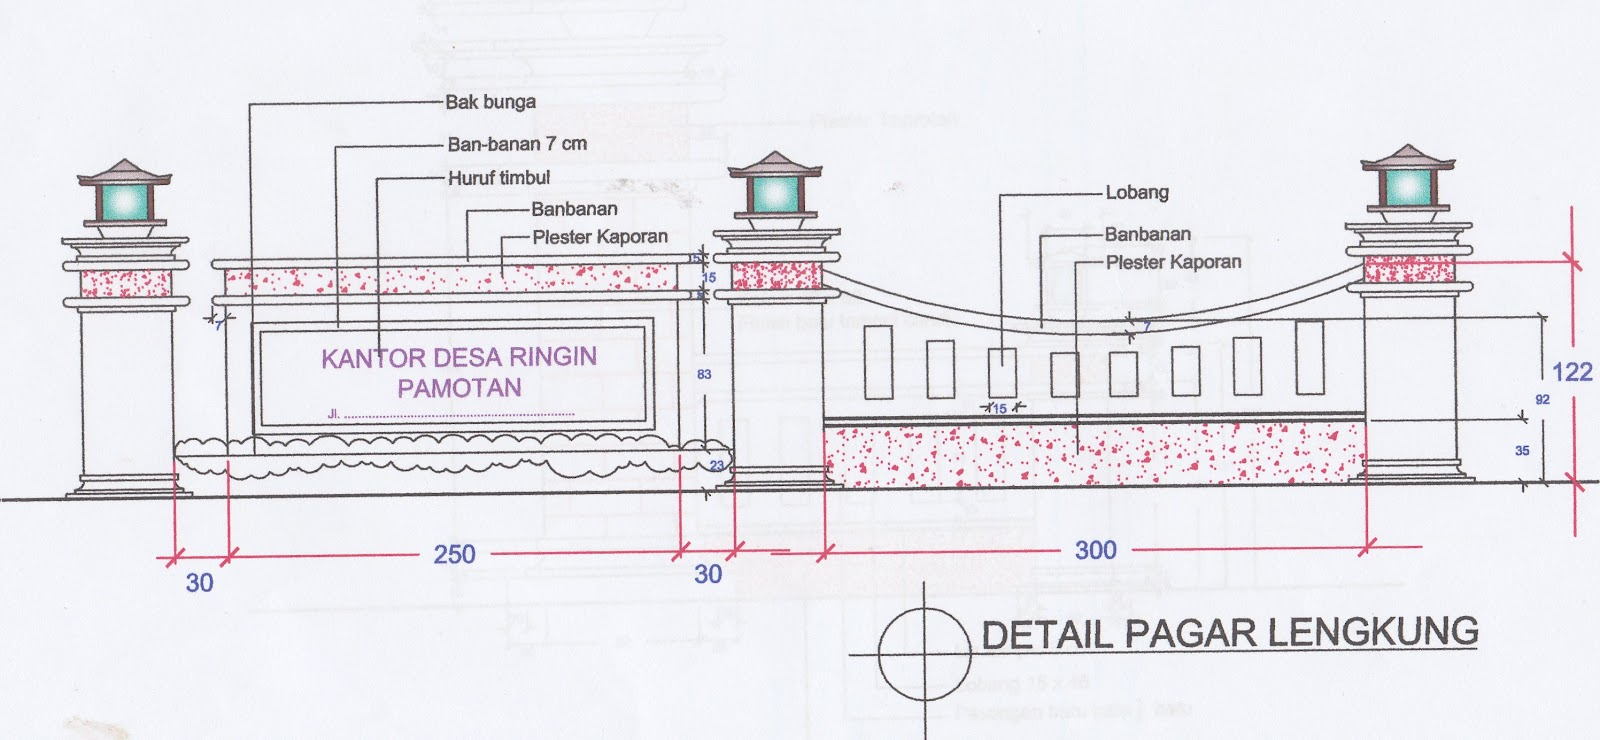 Bathroom Voyeur E Desain Pagar Kantor Pemerintahan